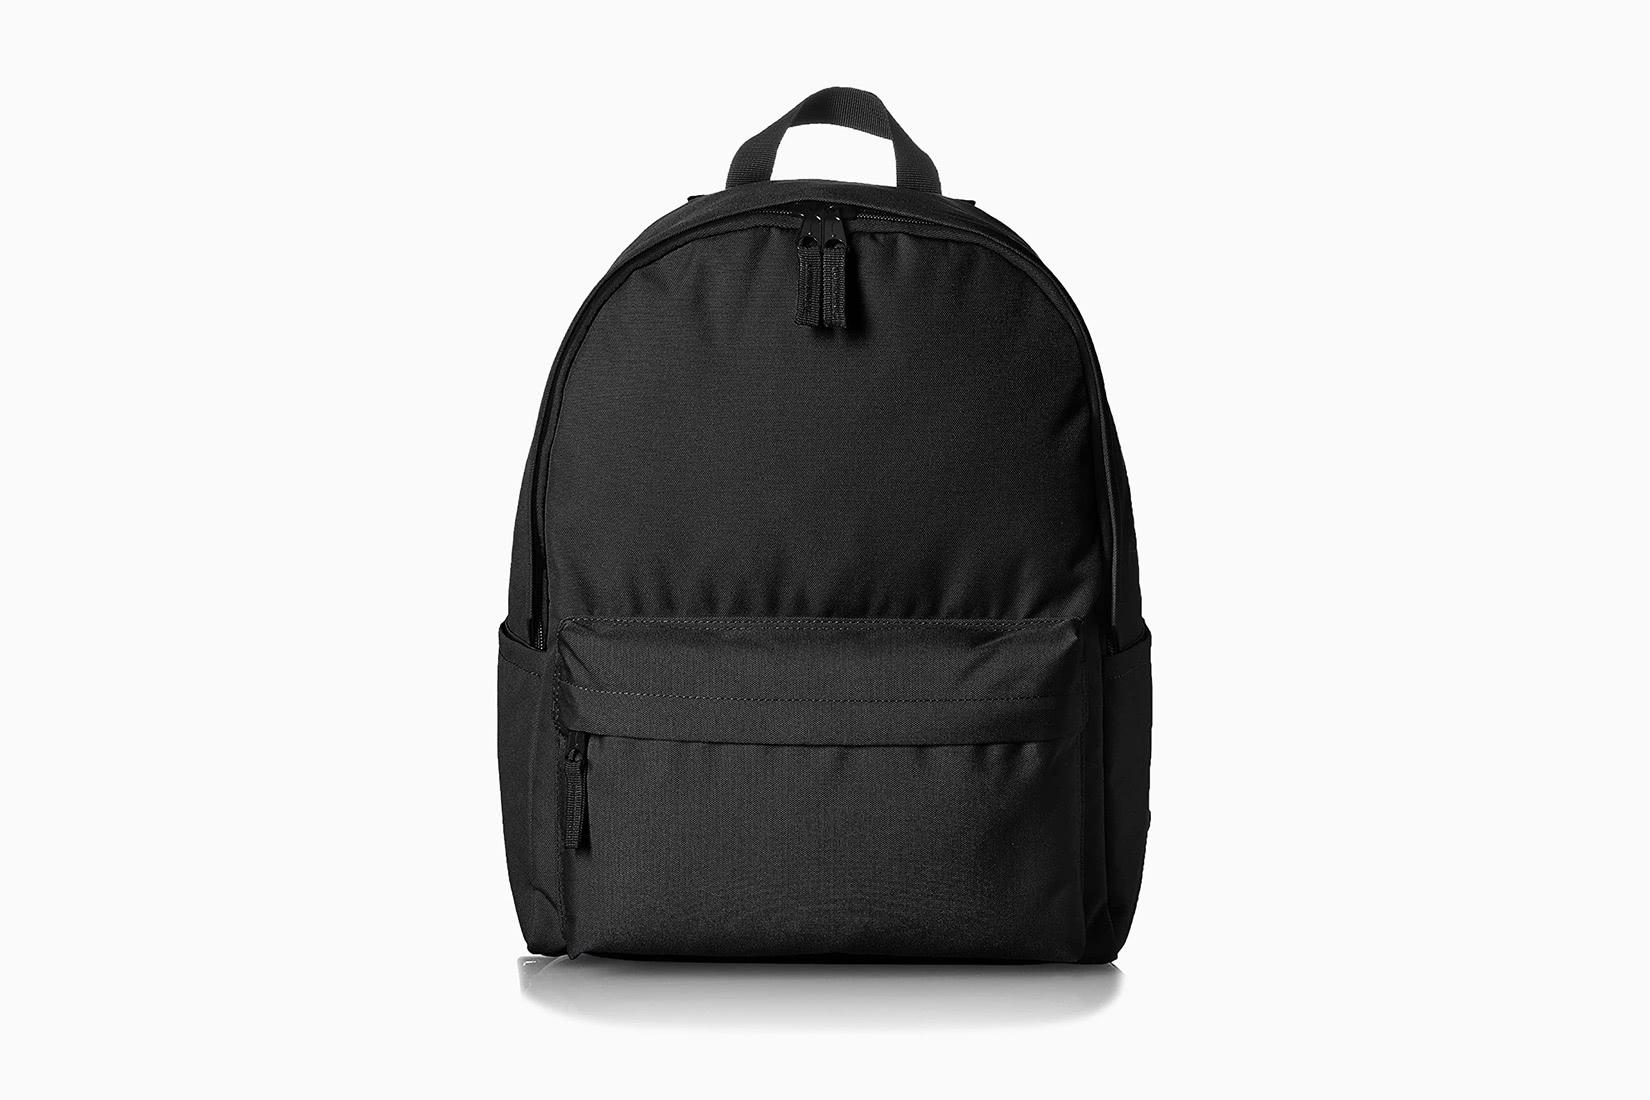 best edc backpack amazonbasics classic school - Luxe Digital